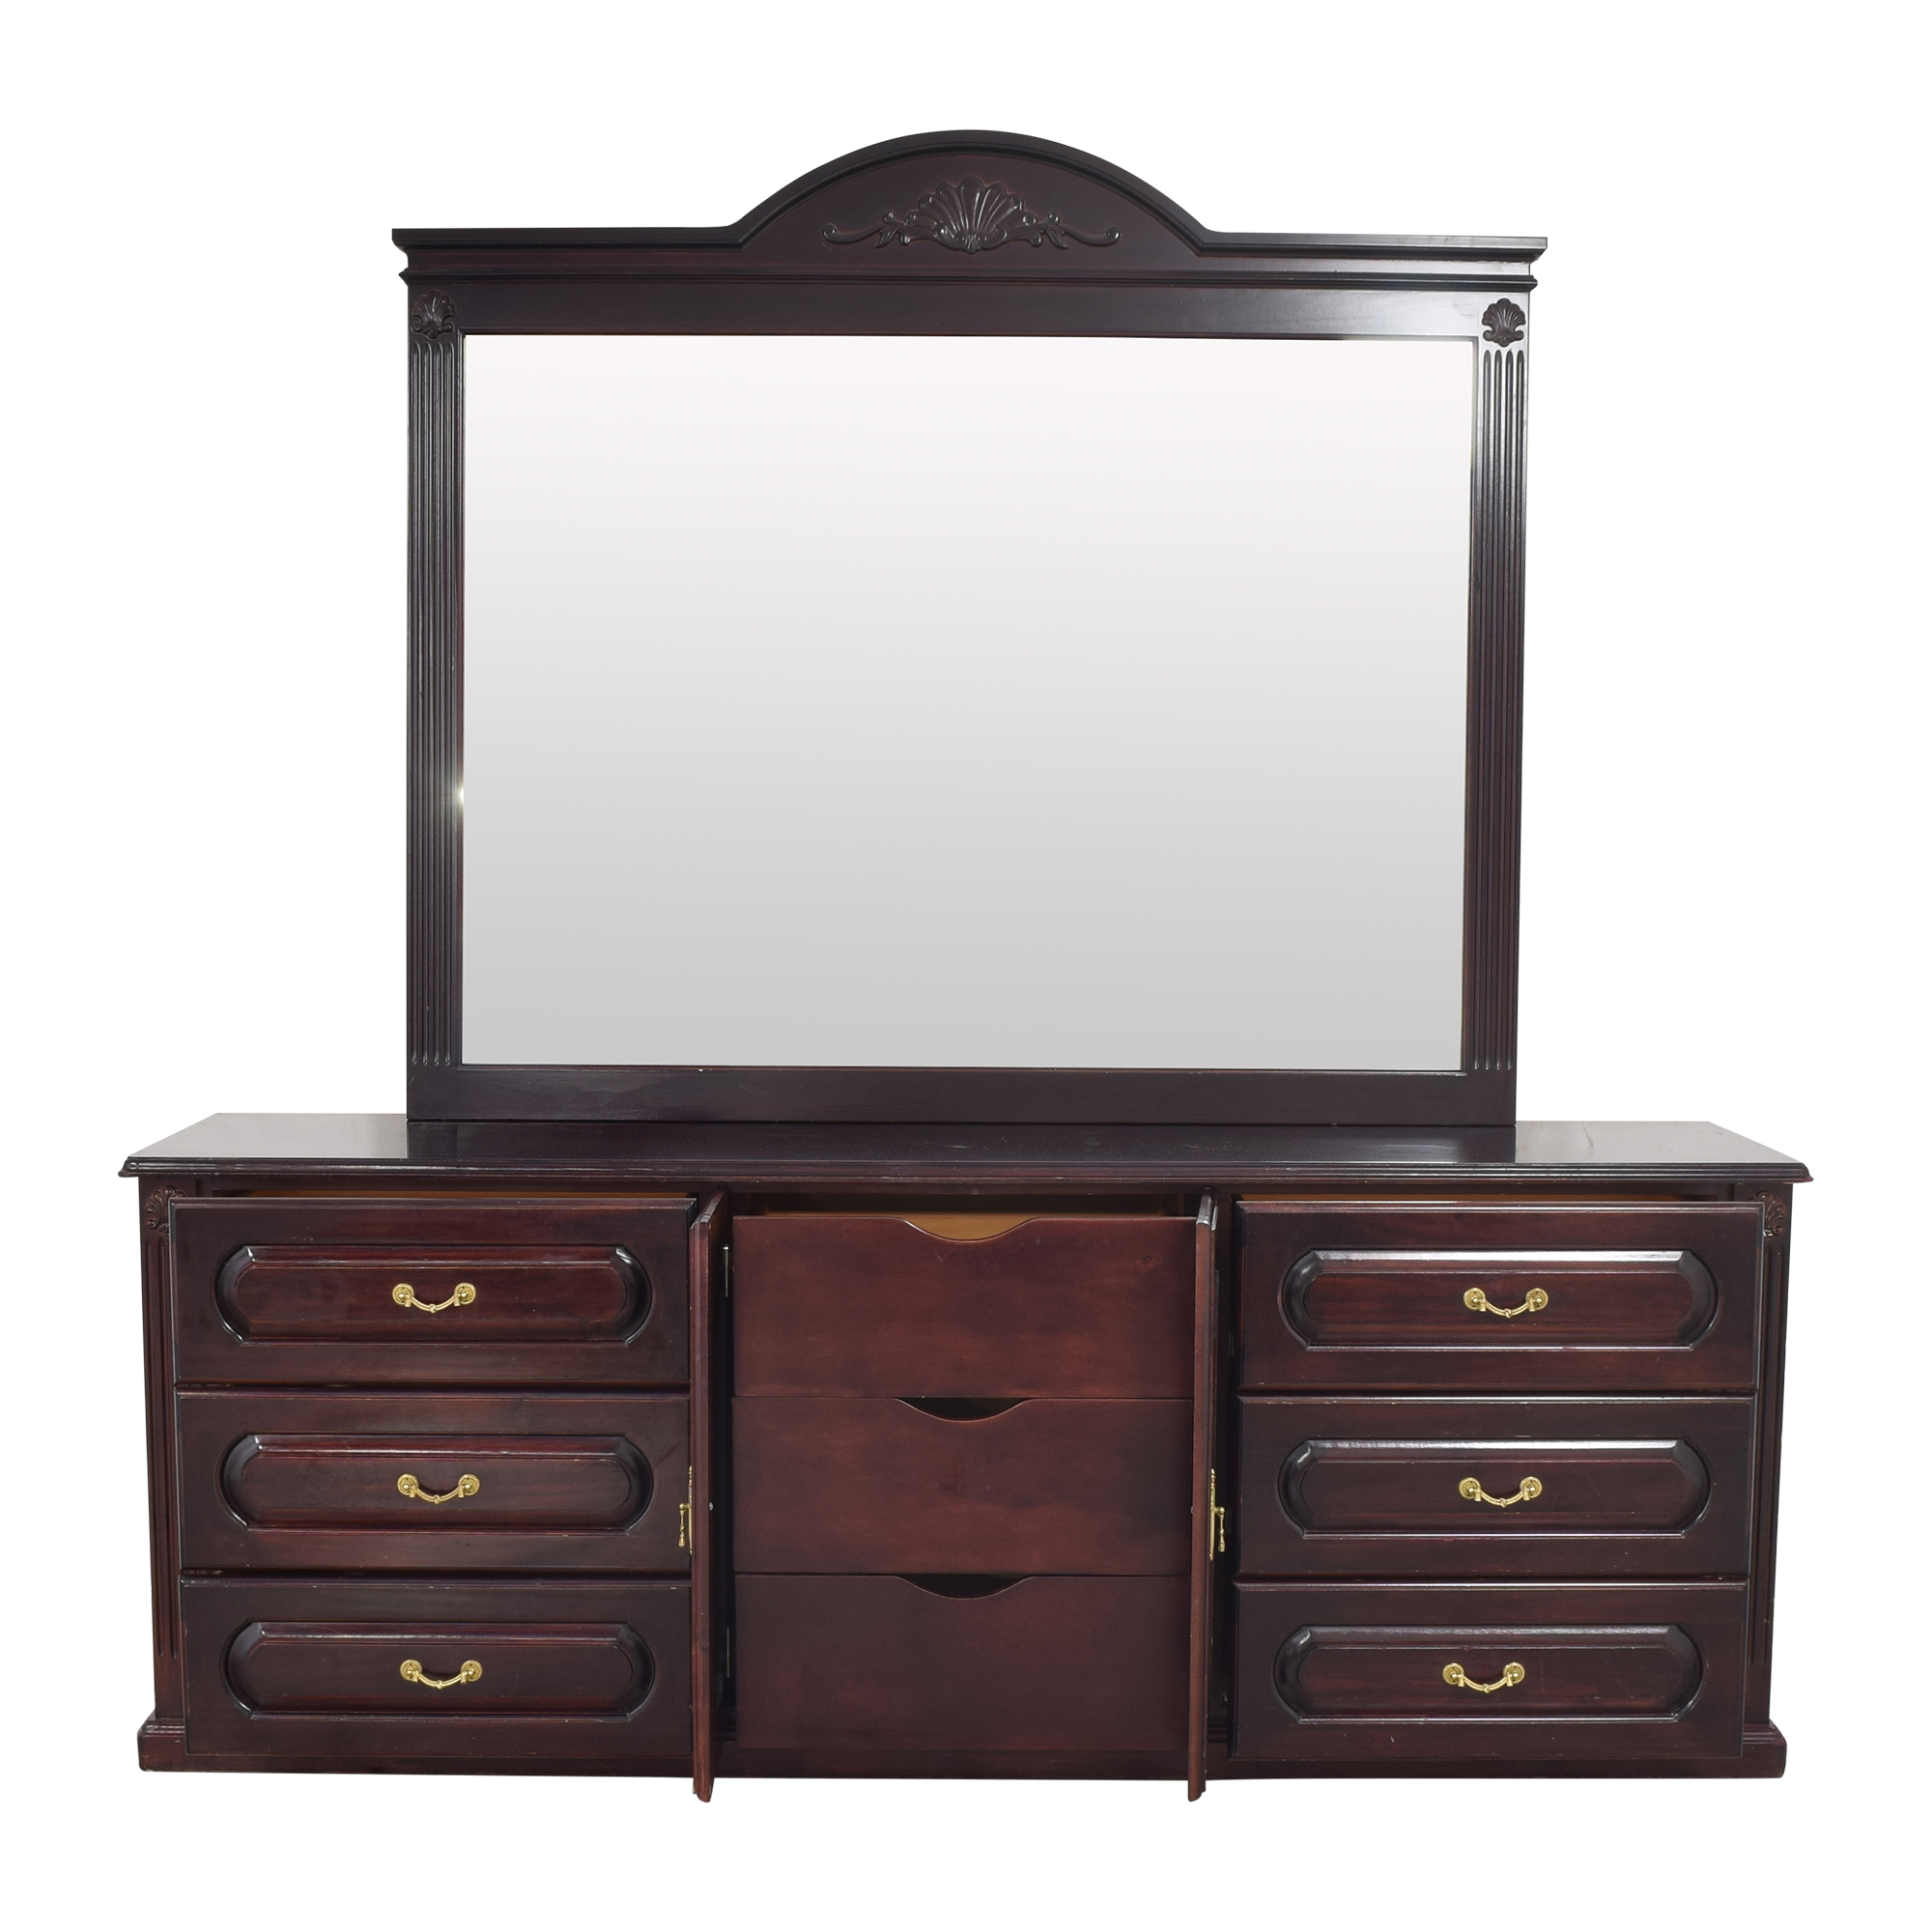 Triple Dresser with Mirror second hand